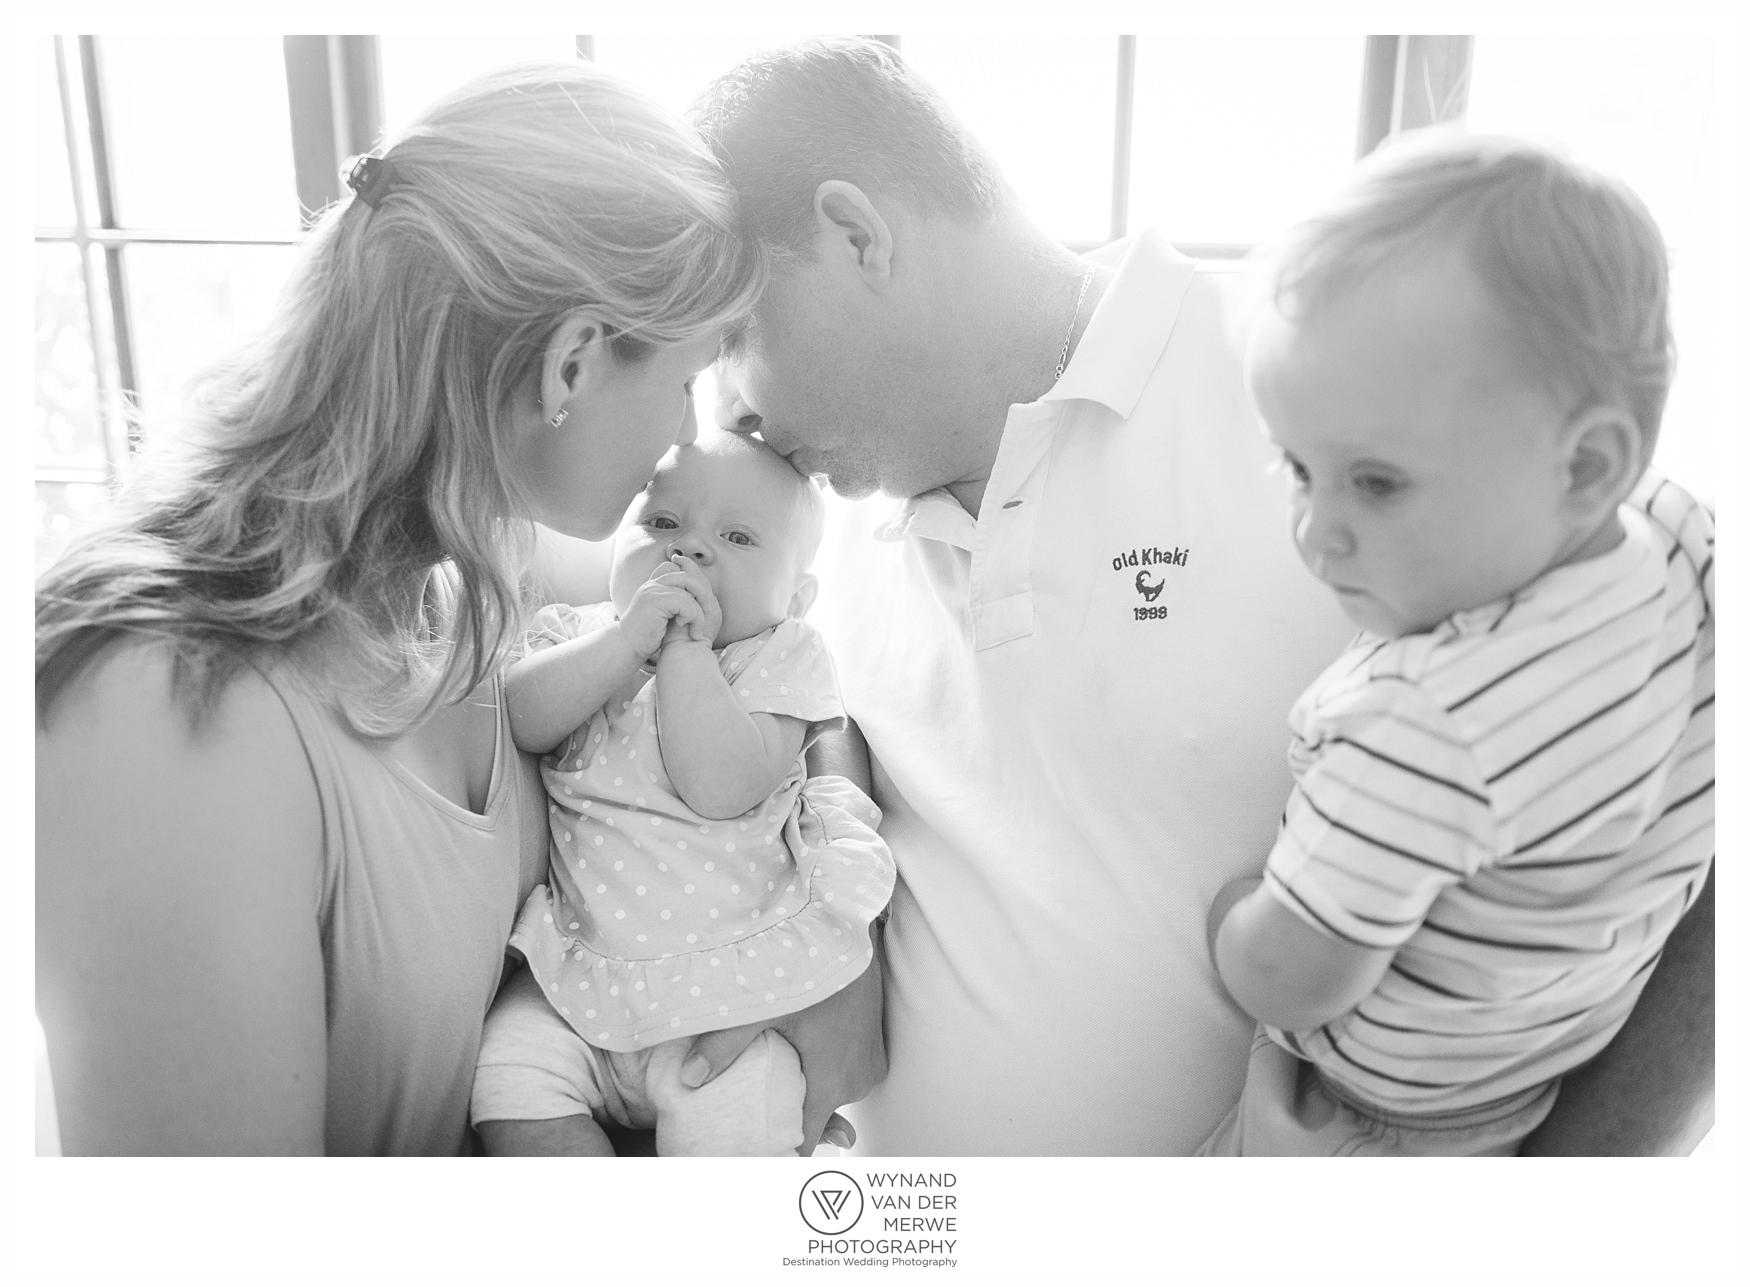 Wynandvandermerwe kirsten robert family lifestyle photography benoni location gauteng-93.jpg